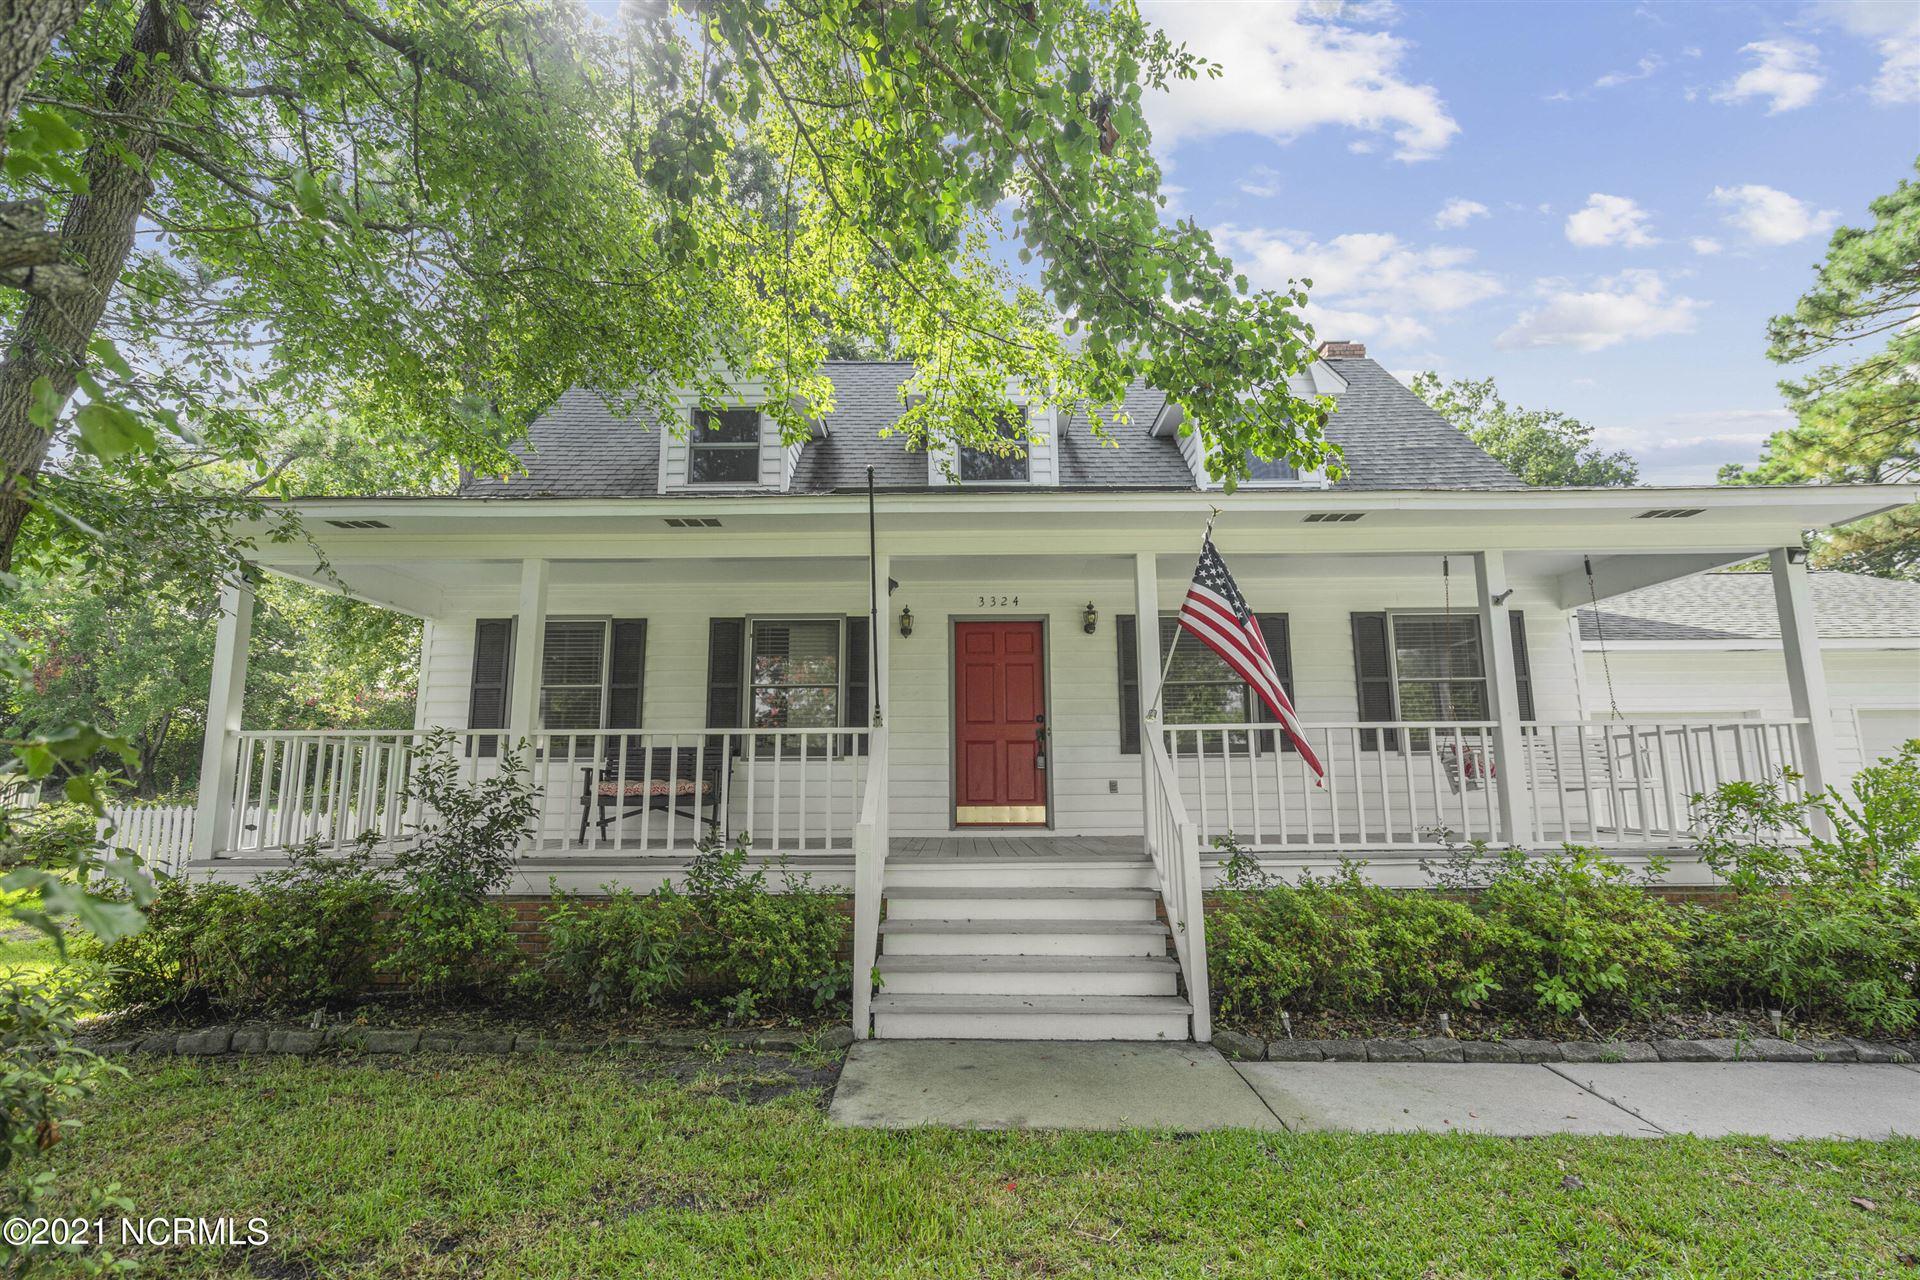 Photo of 3324 Kirby Smith Drive, Wilmington, NC 28409 (MLS # 100281557)